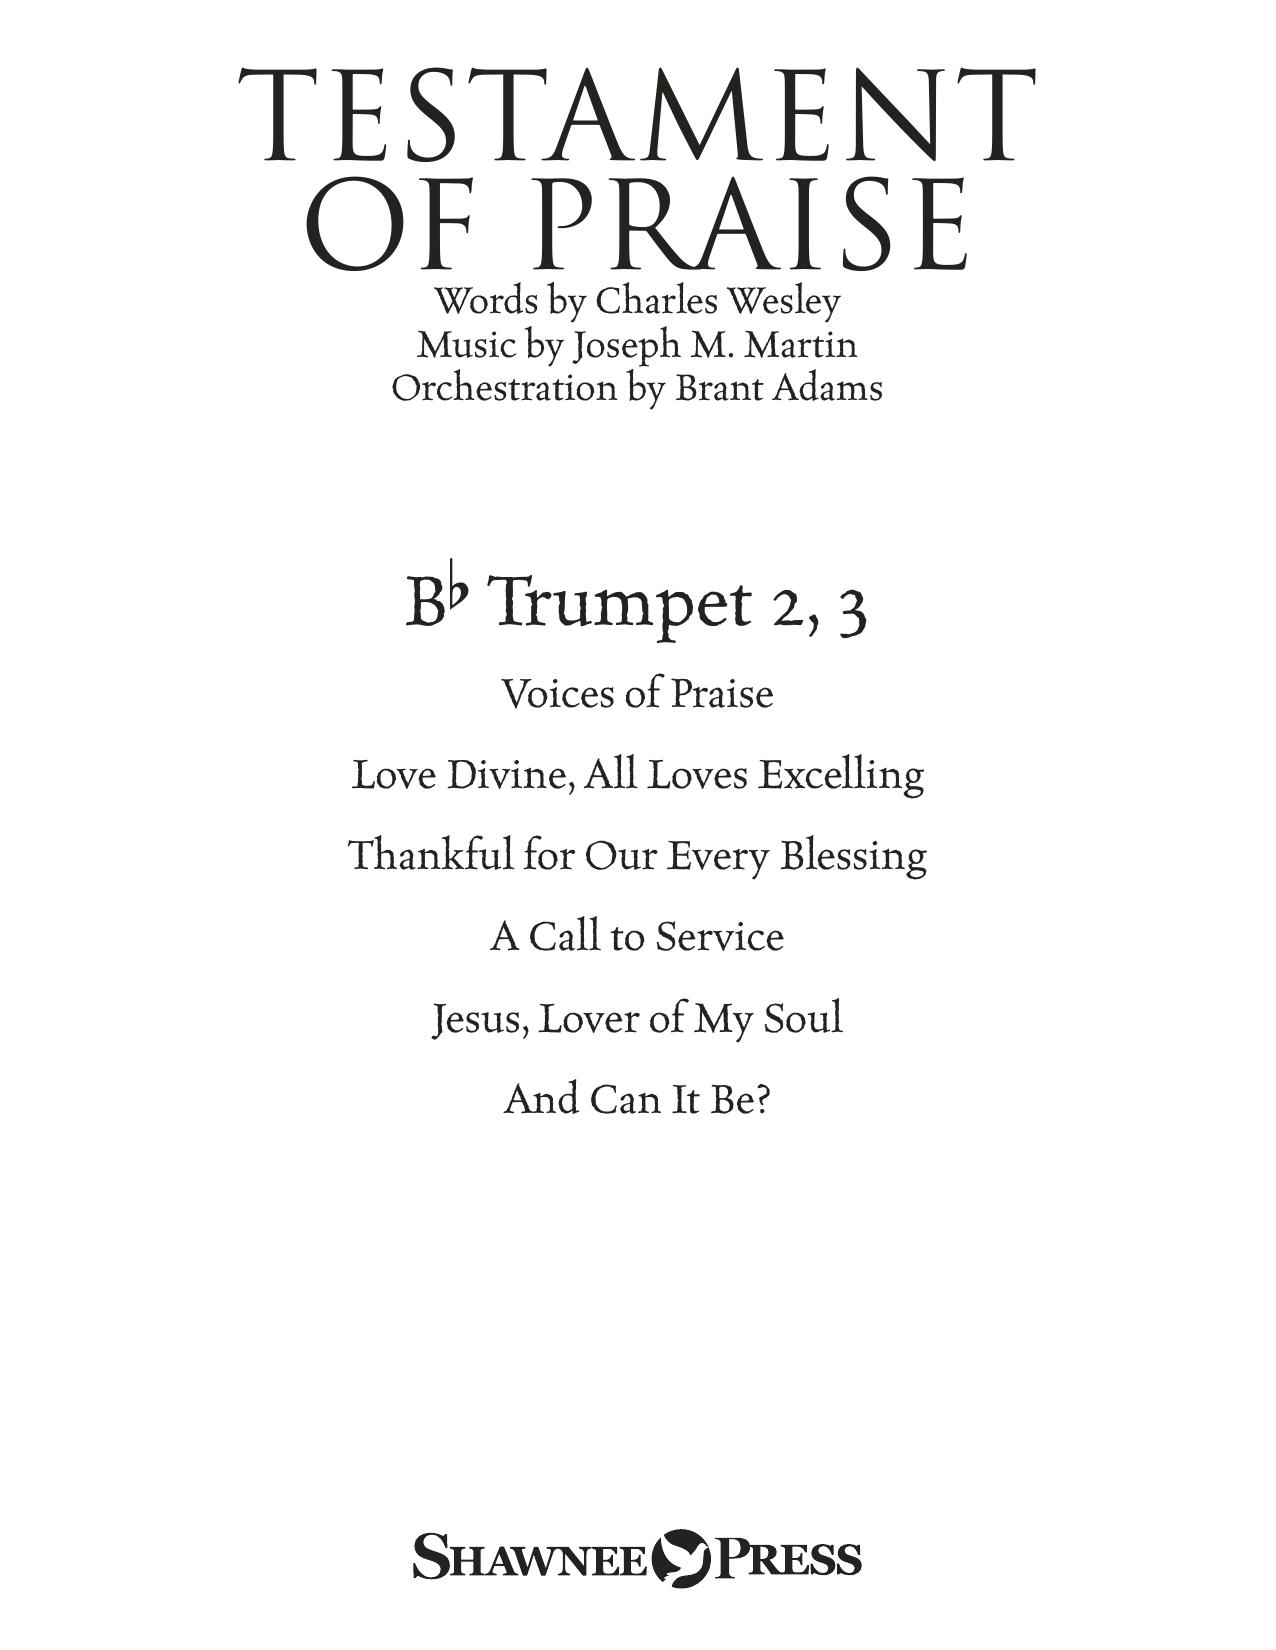 Testament of Praise (A Celebration of Faith) - Bb Trumpet 2,3 Sheet Music